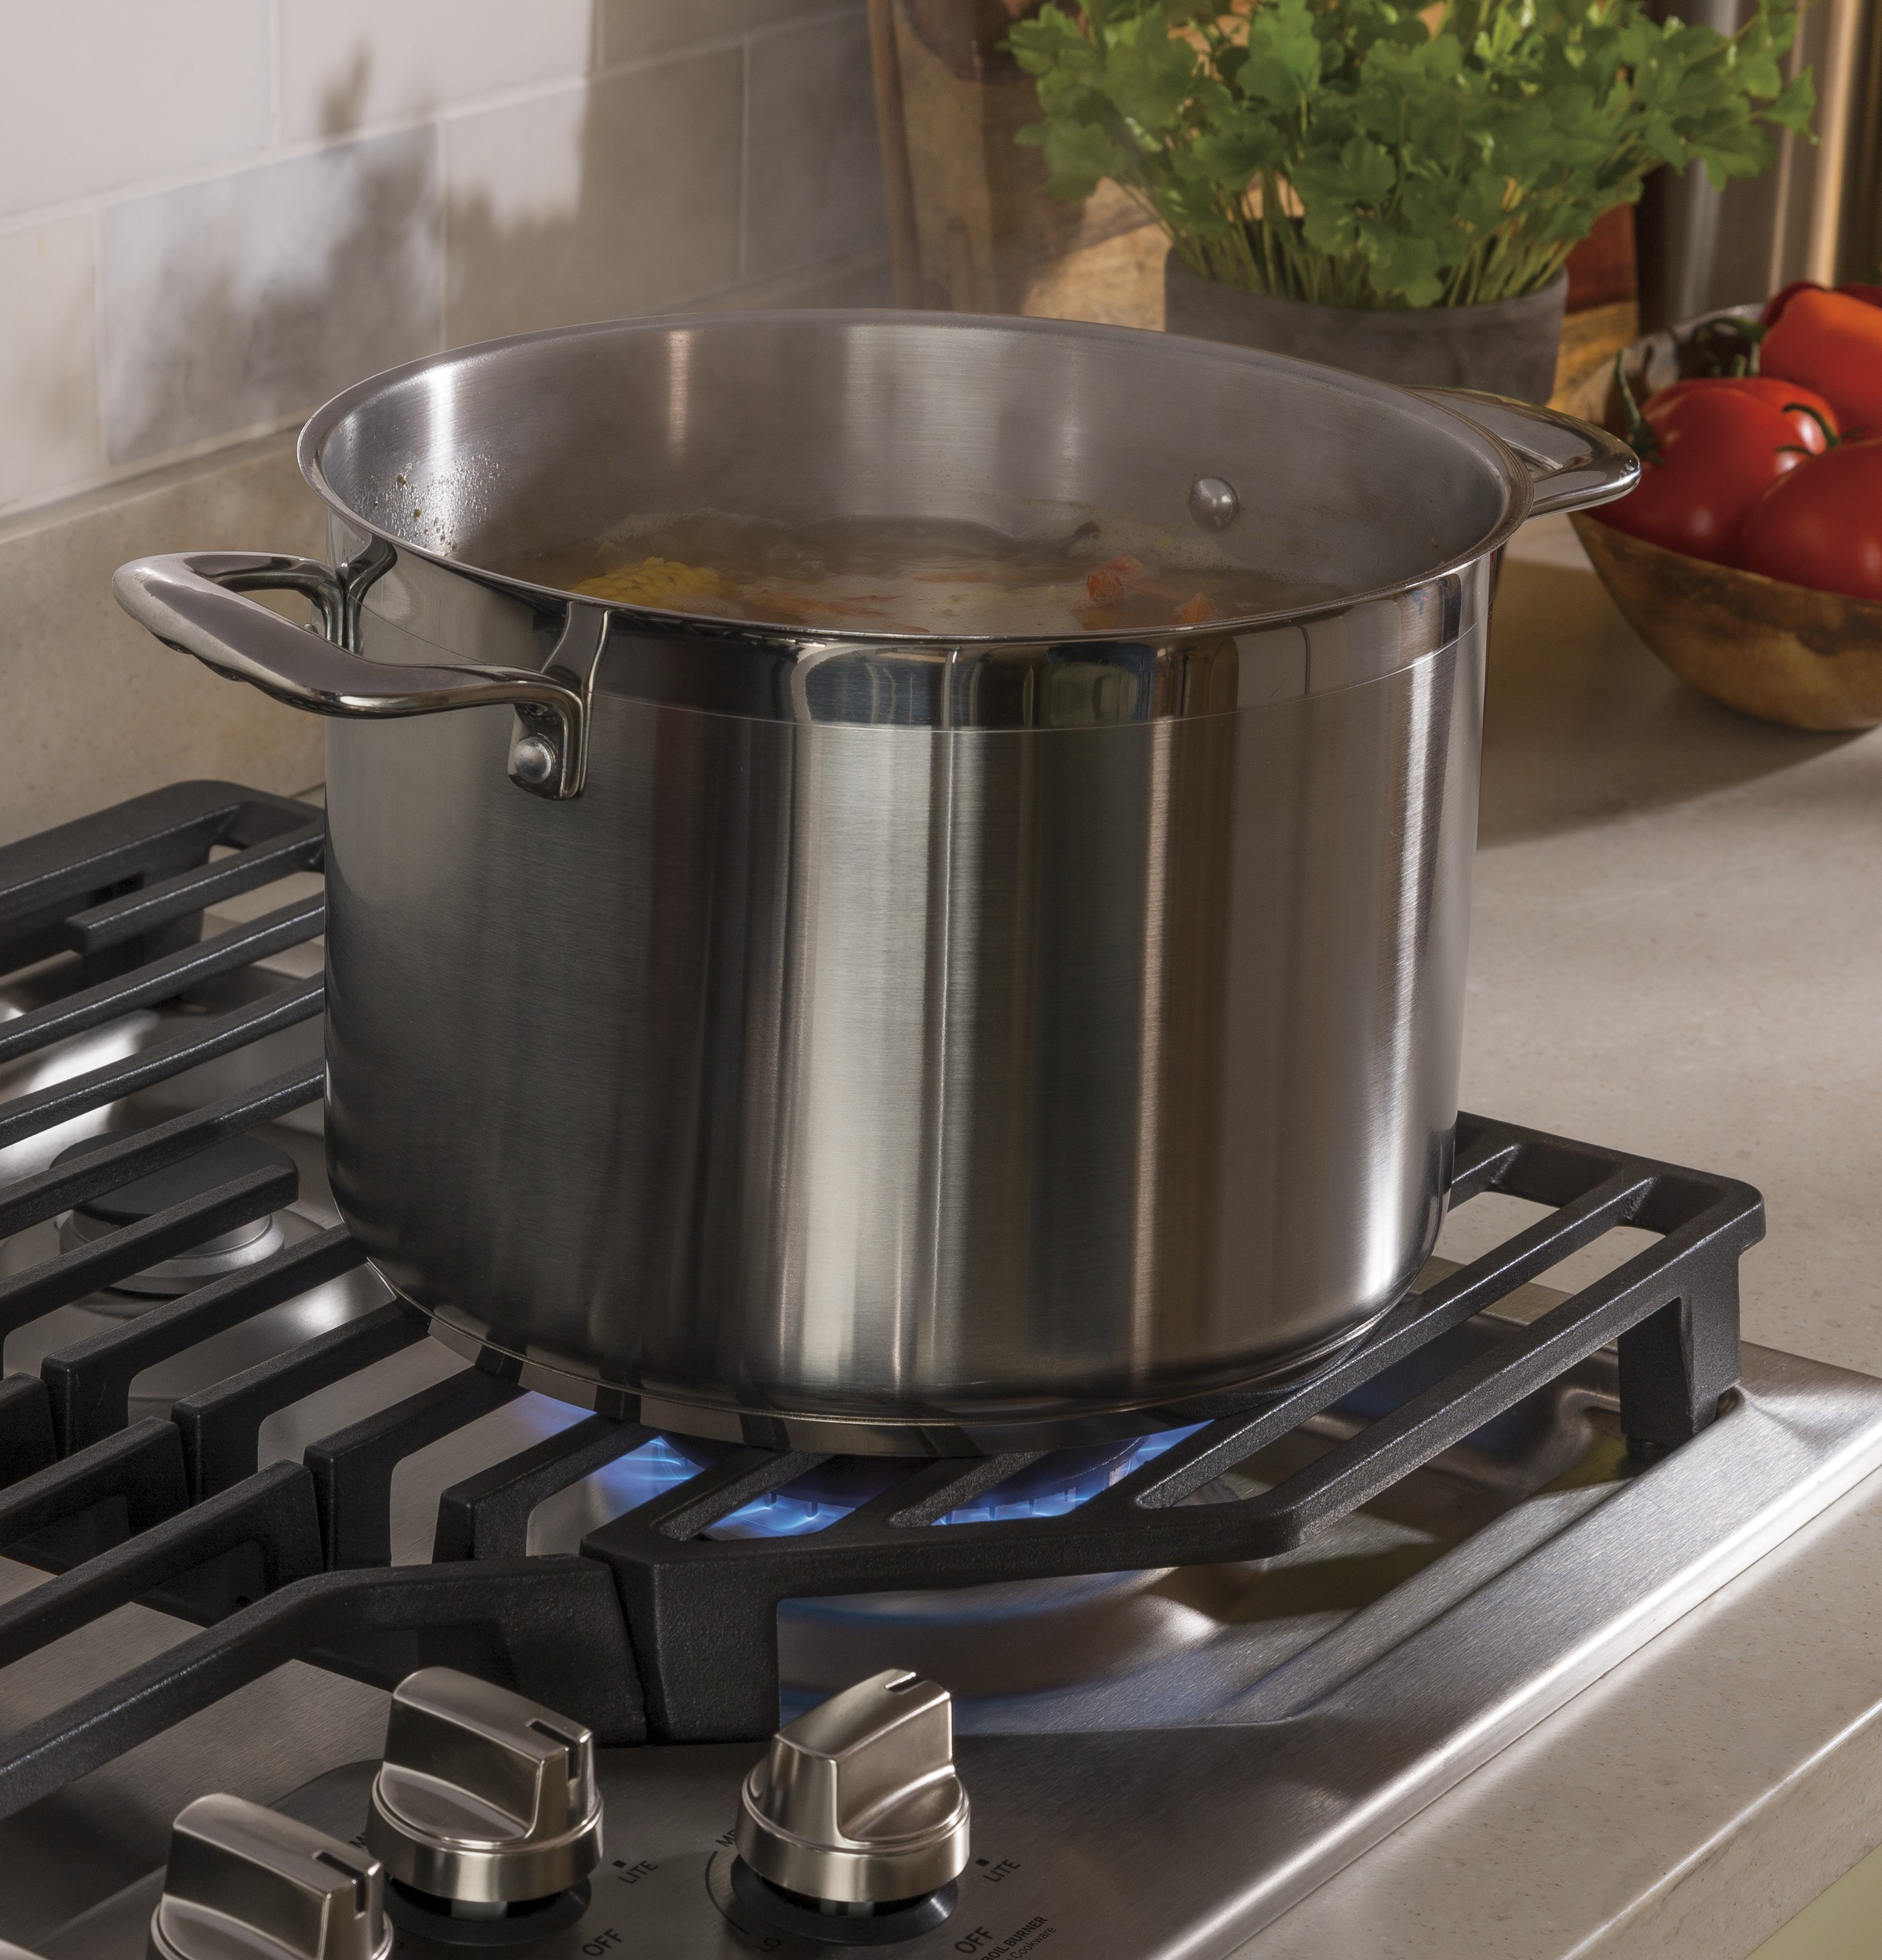 "Model: PGP7036SLSS | GE Profile GE Profile™ Series 36"" Built-In Gas Cooktop"